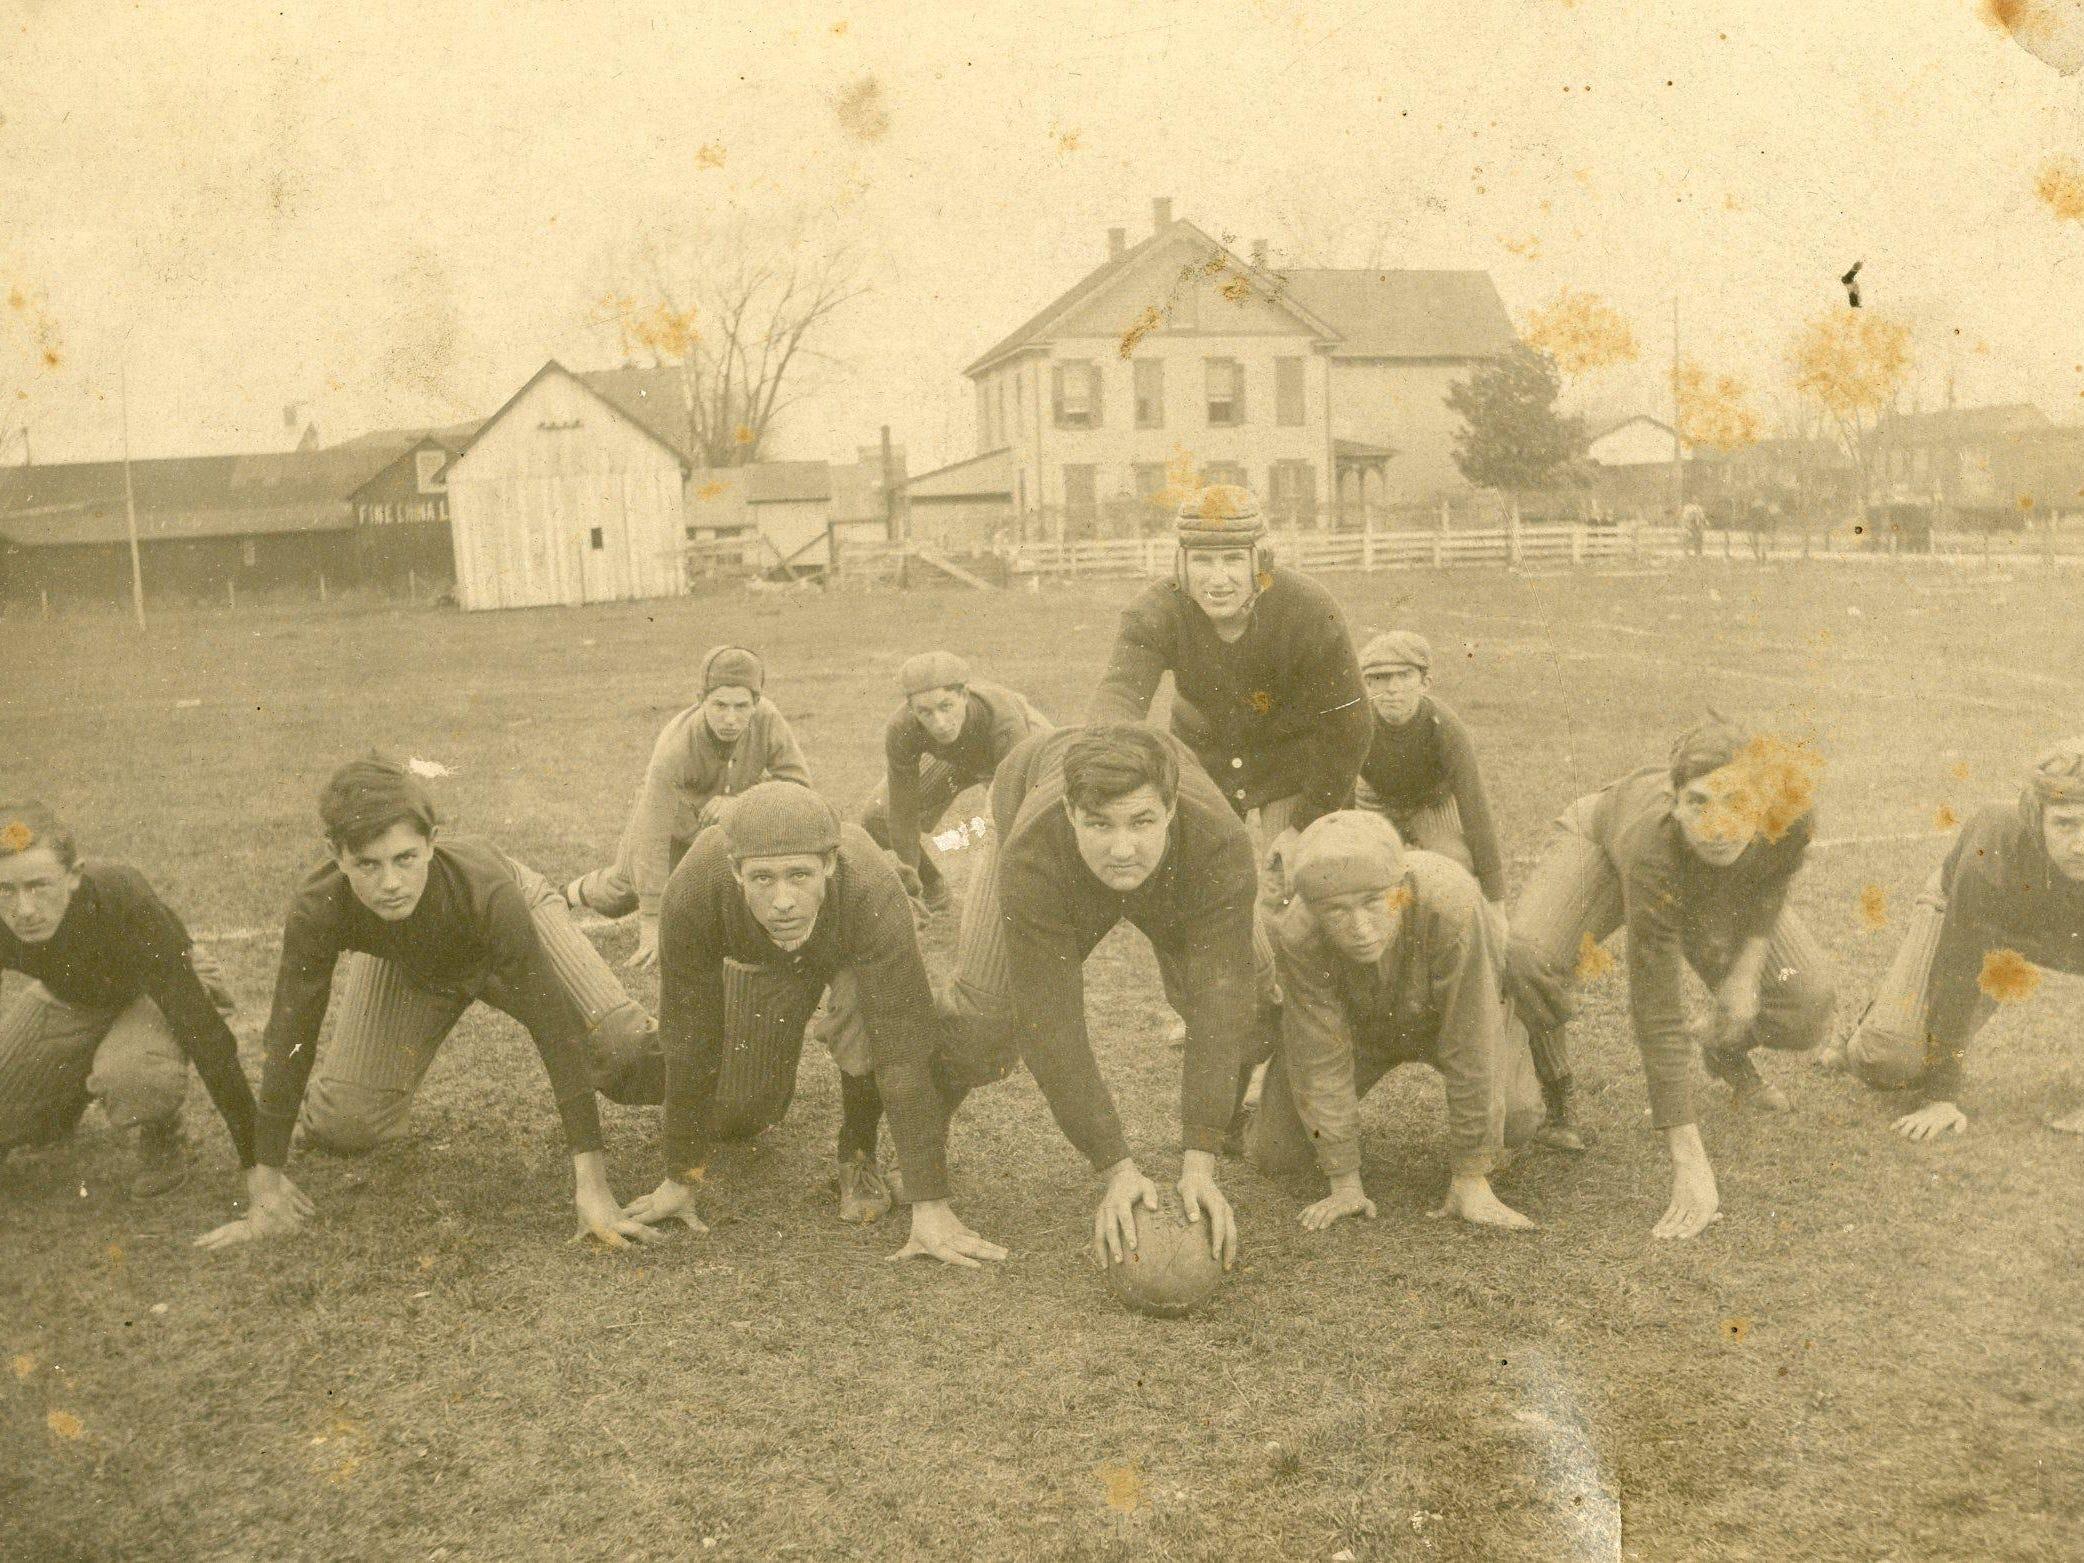 The Georgetown football team in 1912.